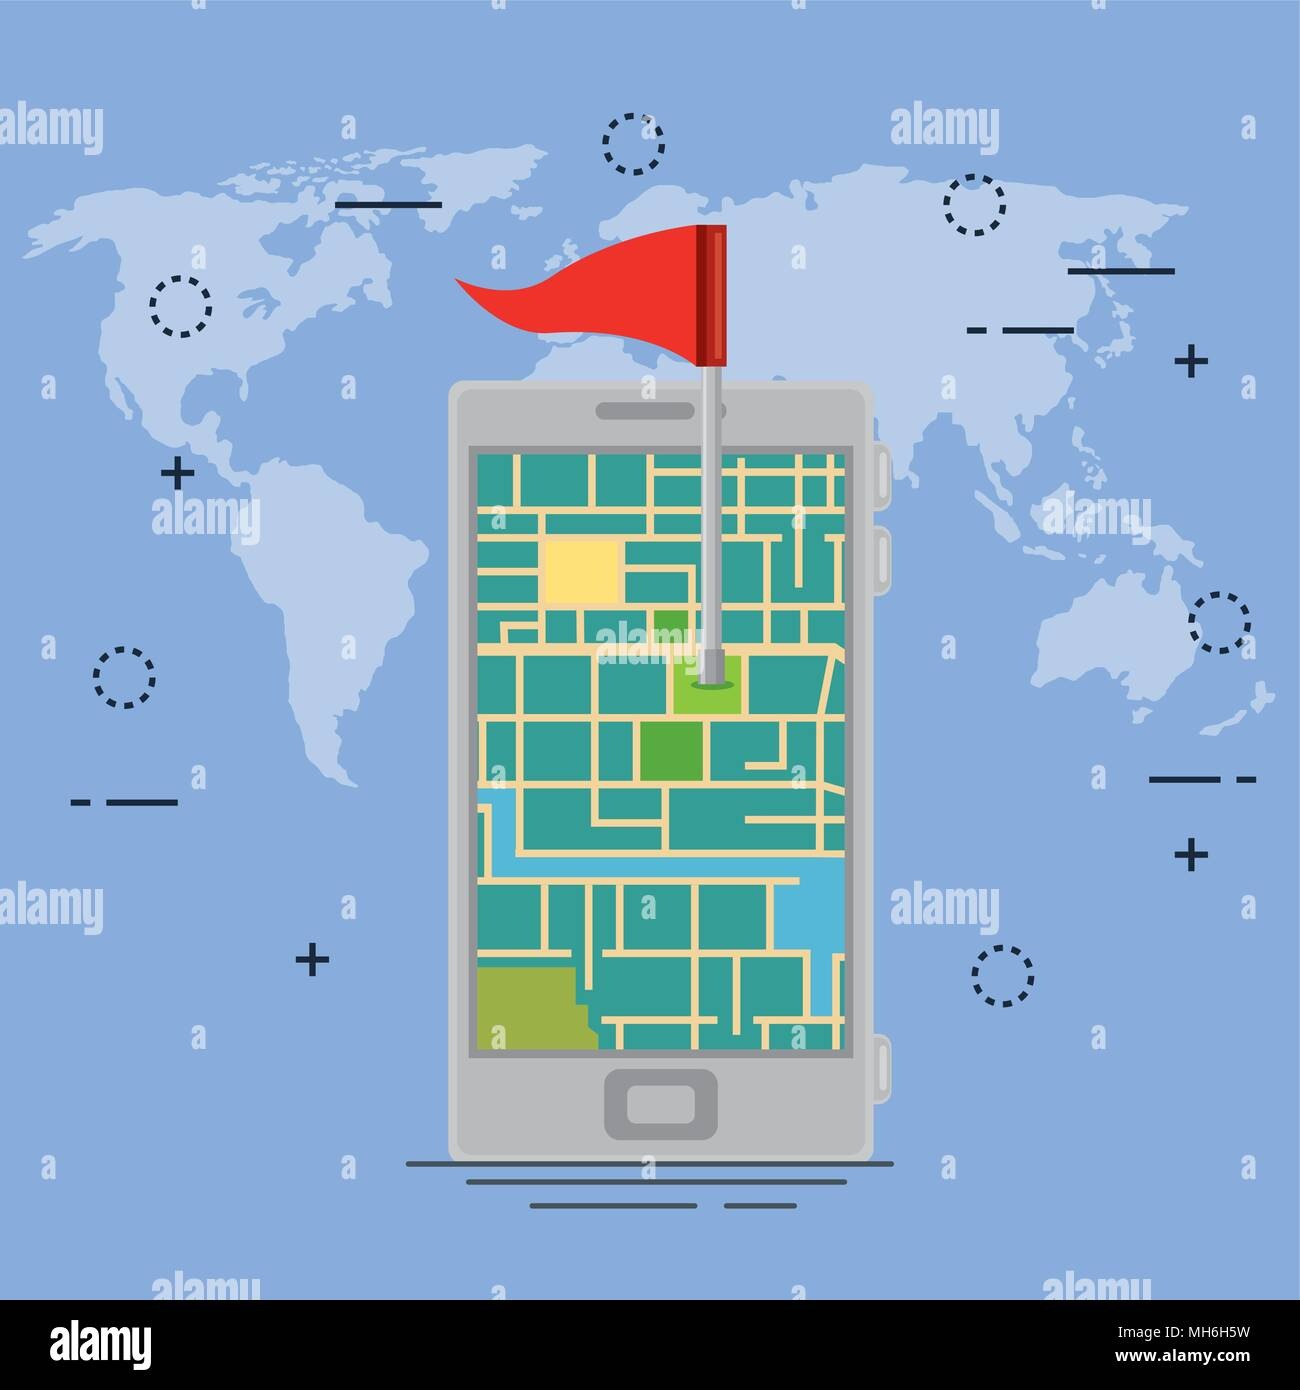 smartphone with gps navigation app Stock Vector